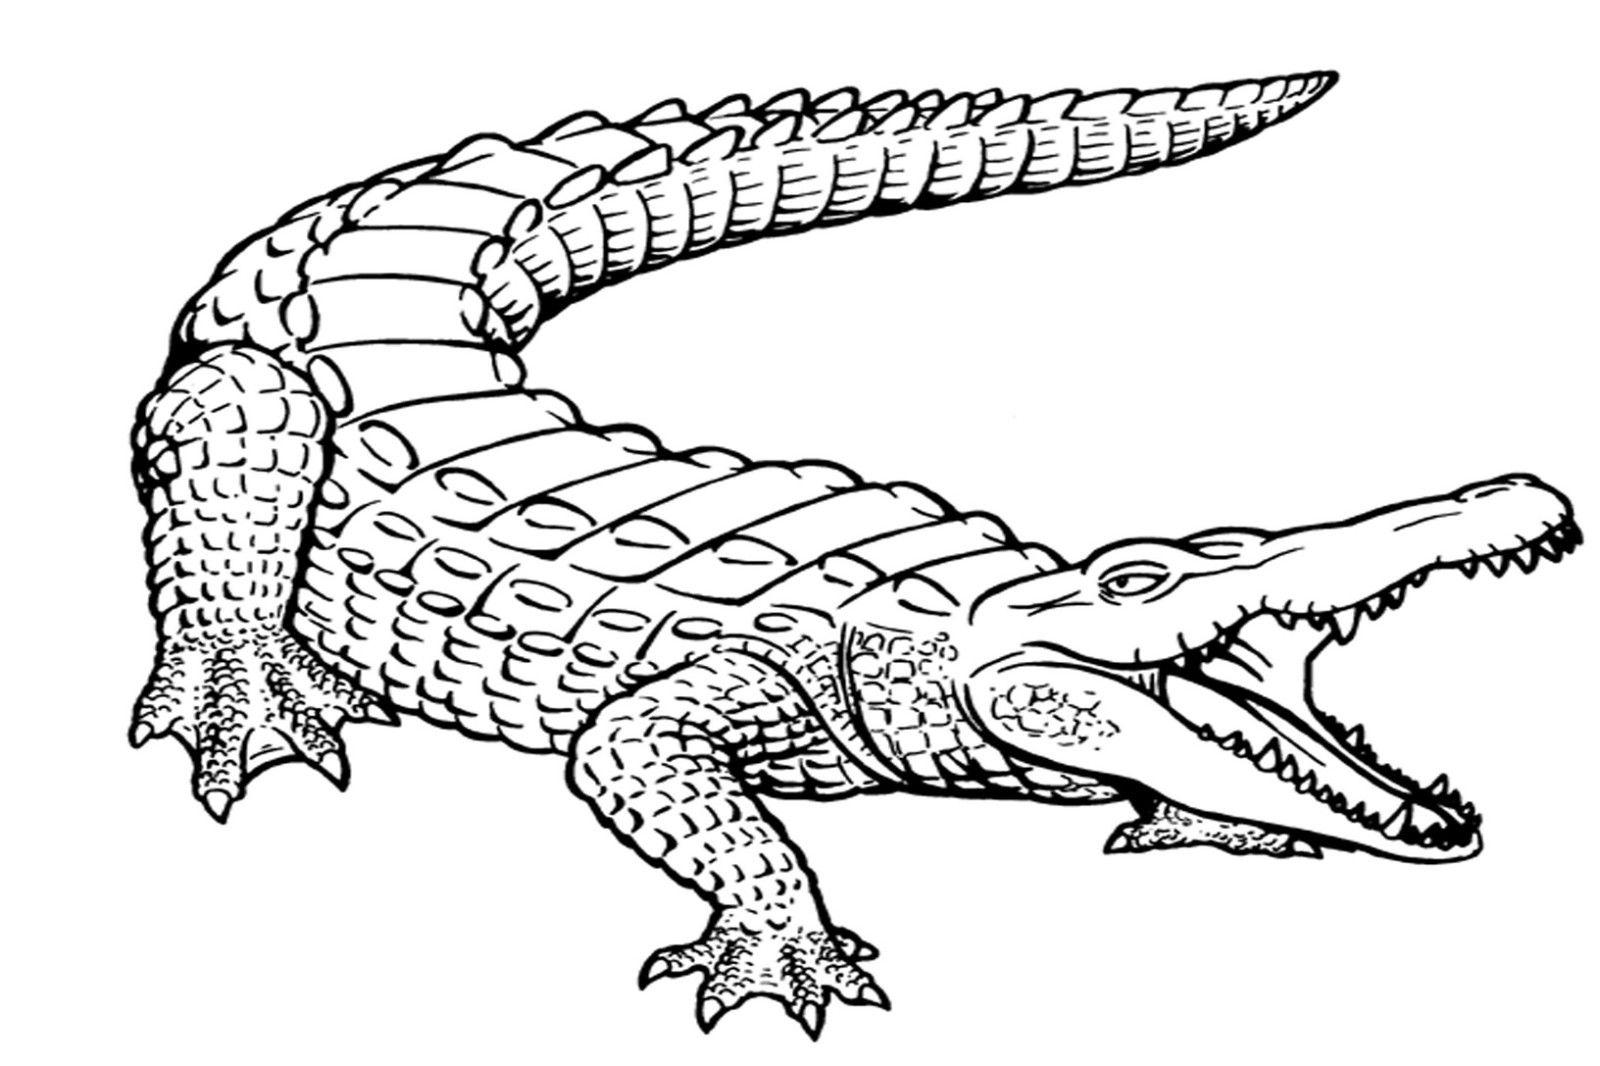 Alligator Coloring Pages | Cocodrilo Dibujo, Tatuaje De mit Krokodil Zum Ausmalen